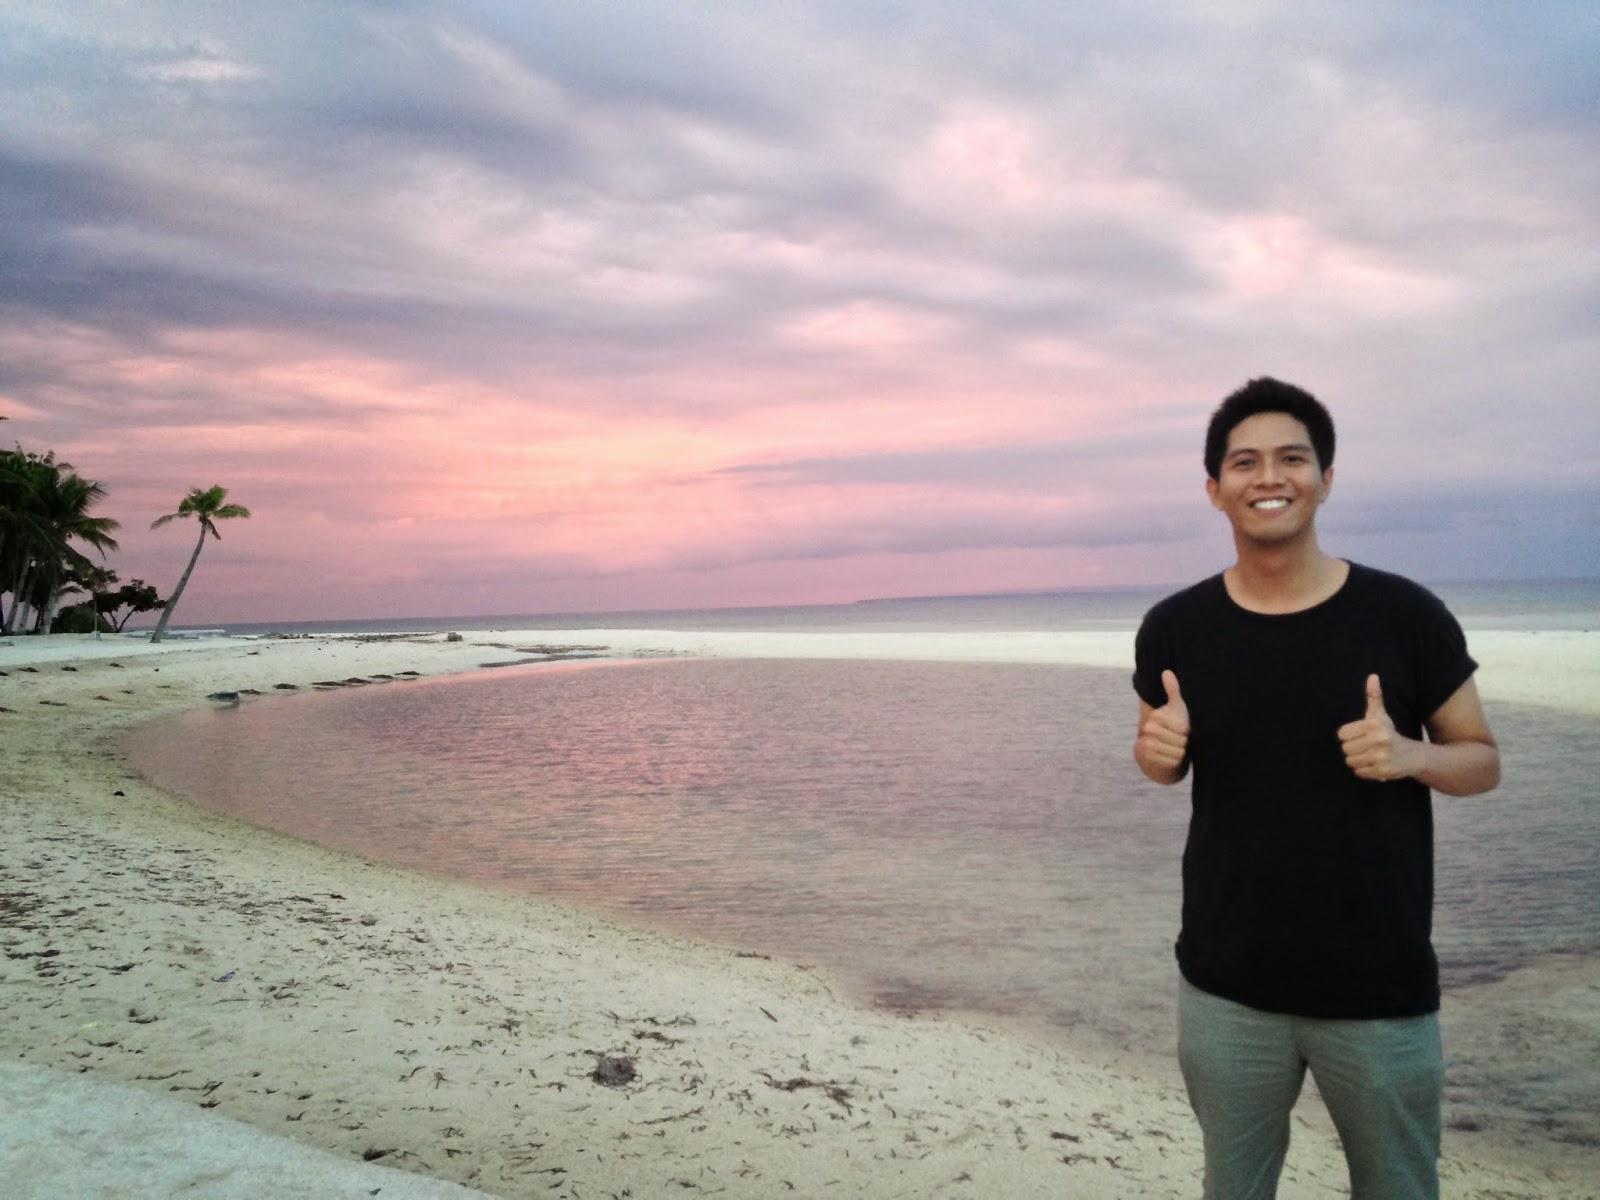 philippine travel places